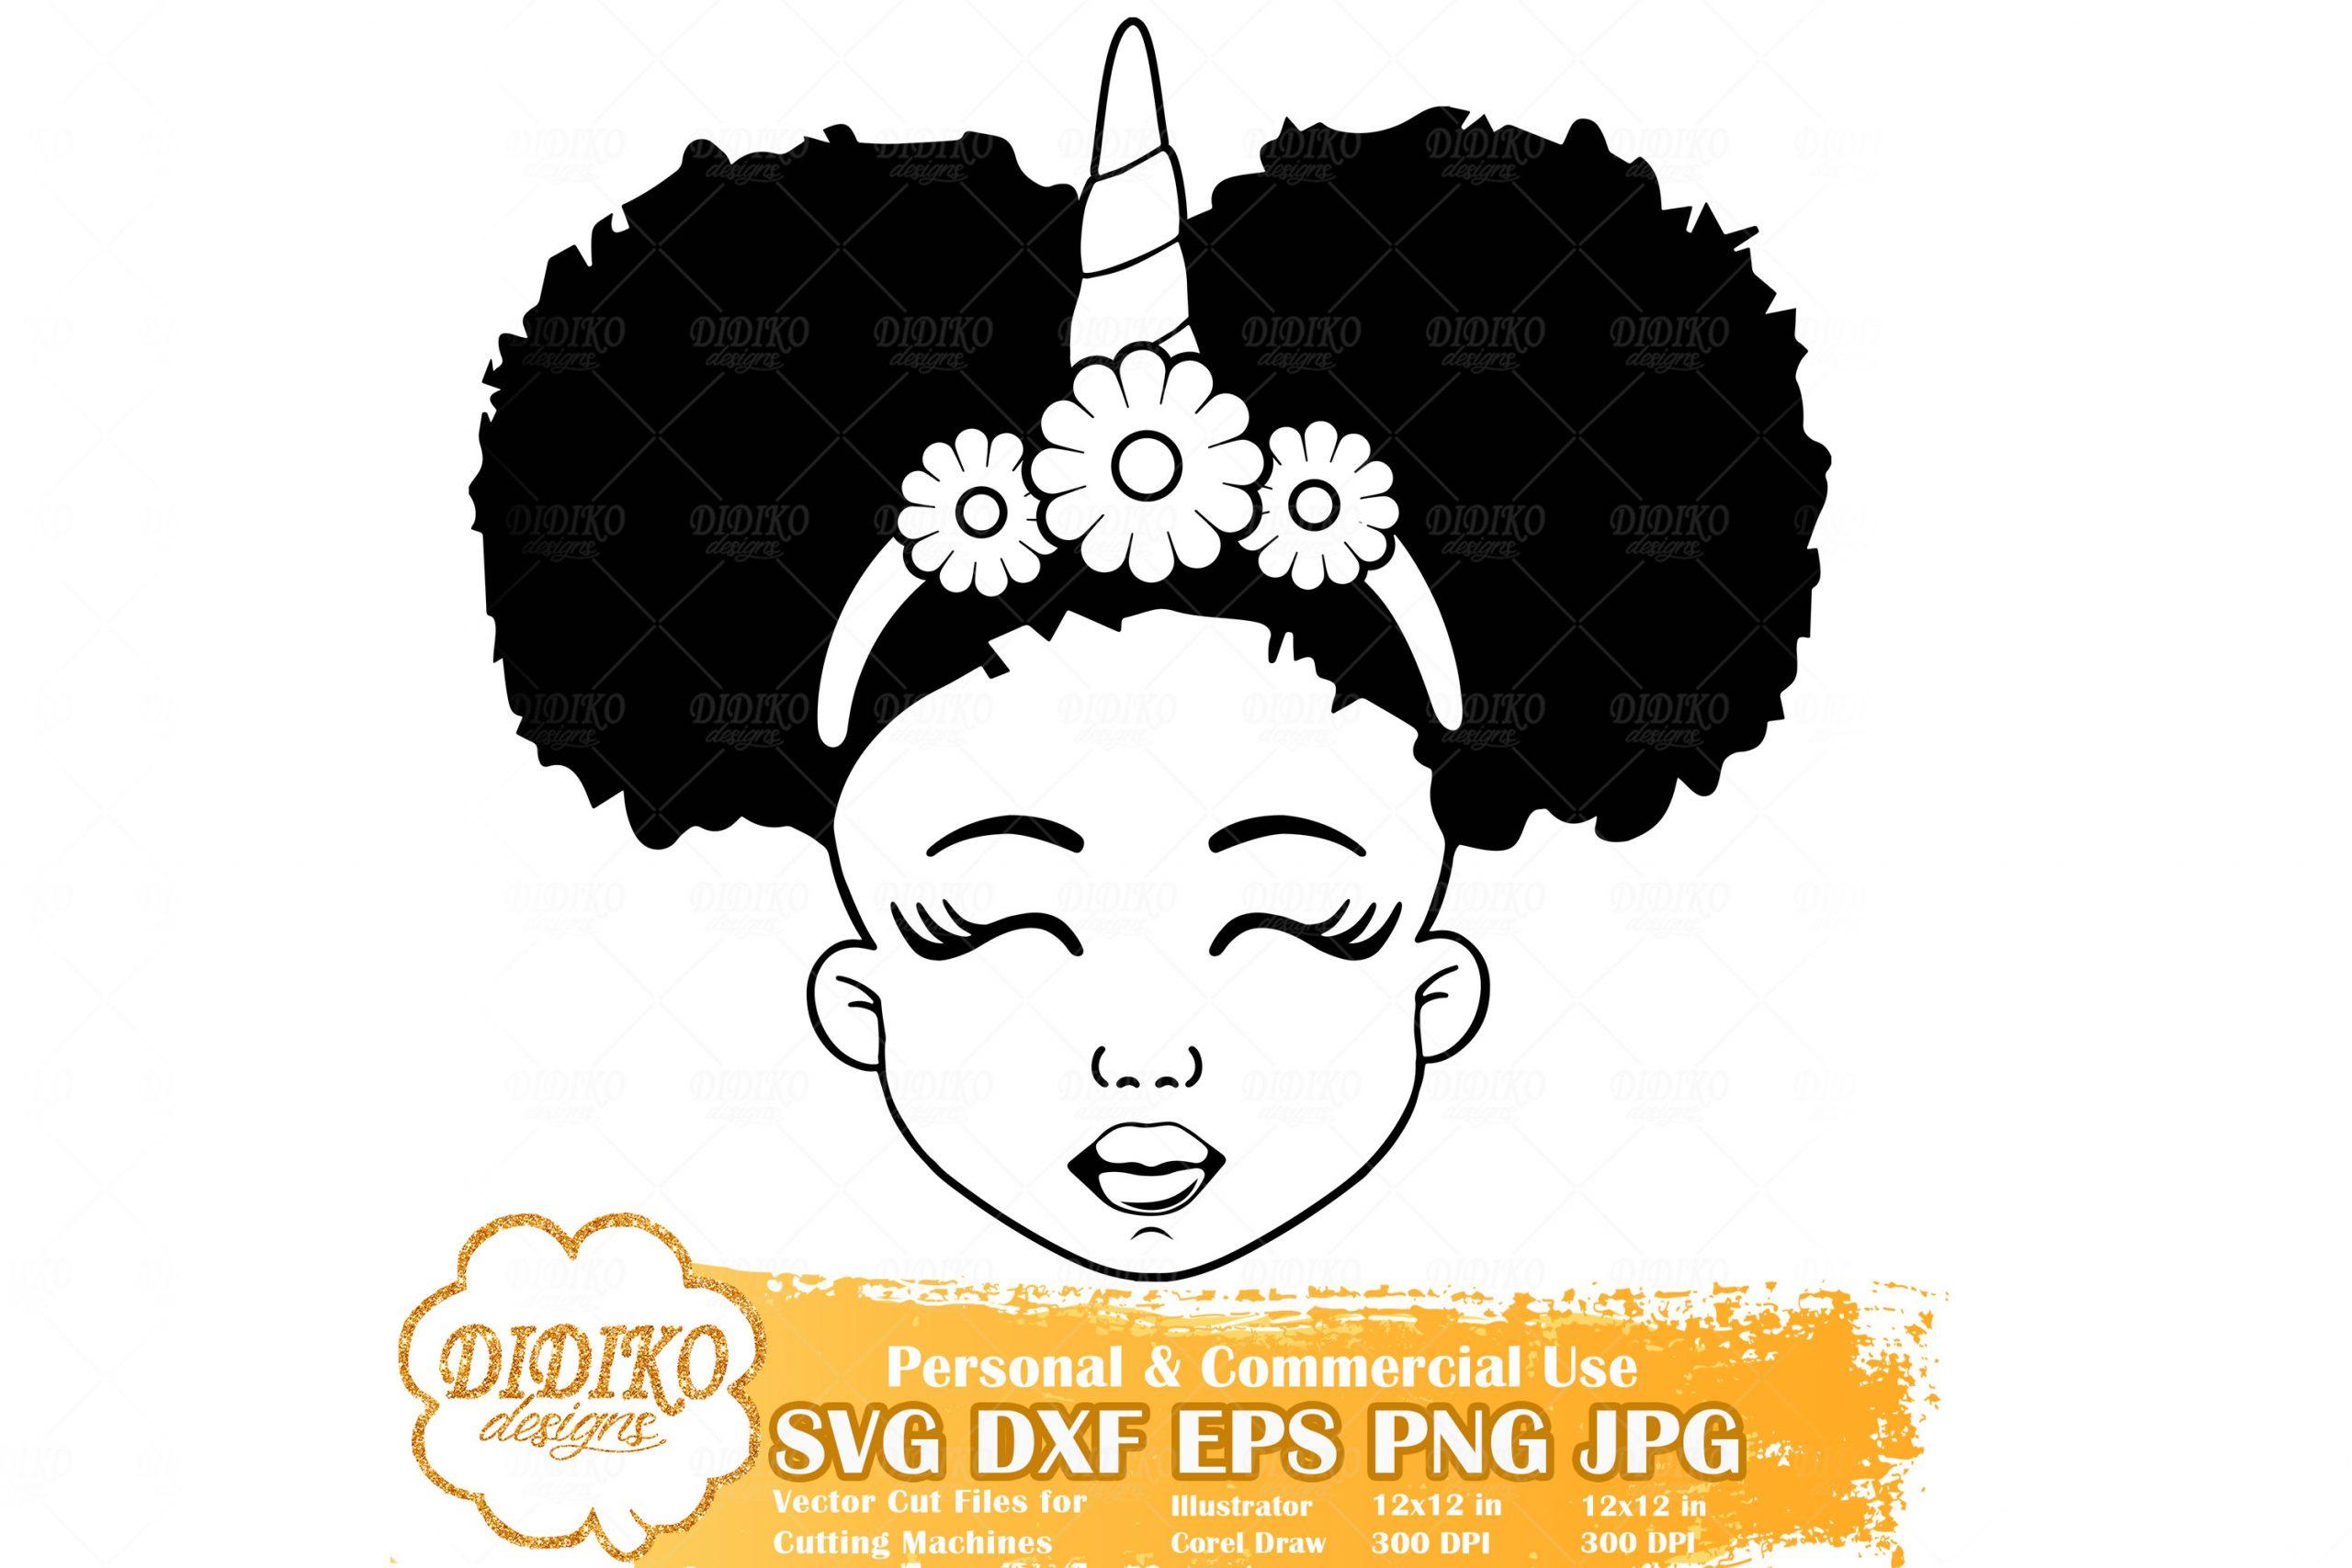 Black Girl Unicorn Svg 1 Afro Unicorn Silhouette Svg Didiko Designs